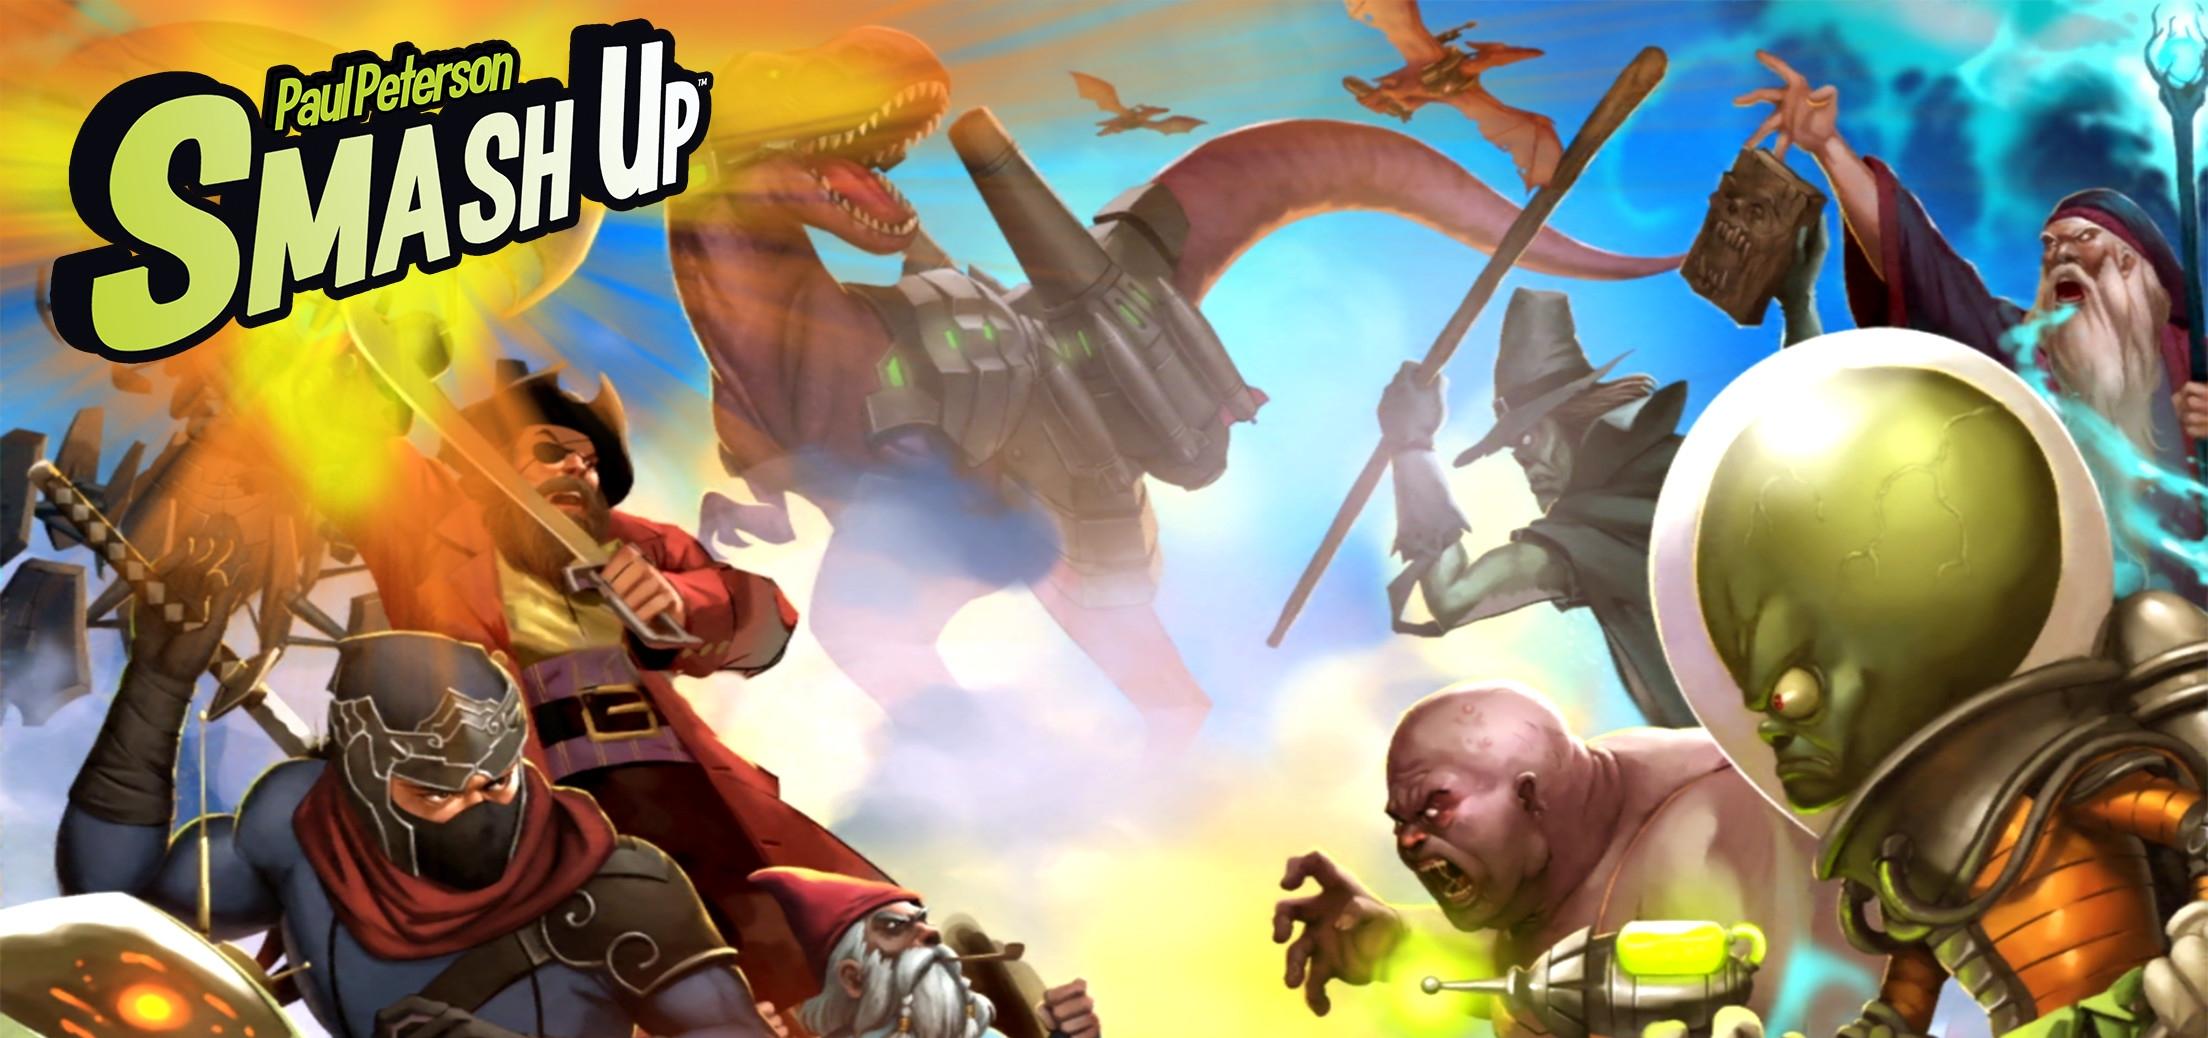 Asmodee Digital brings the award-winning pop culture mashup game